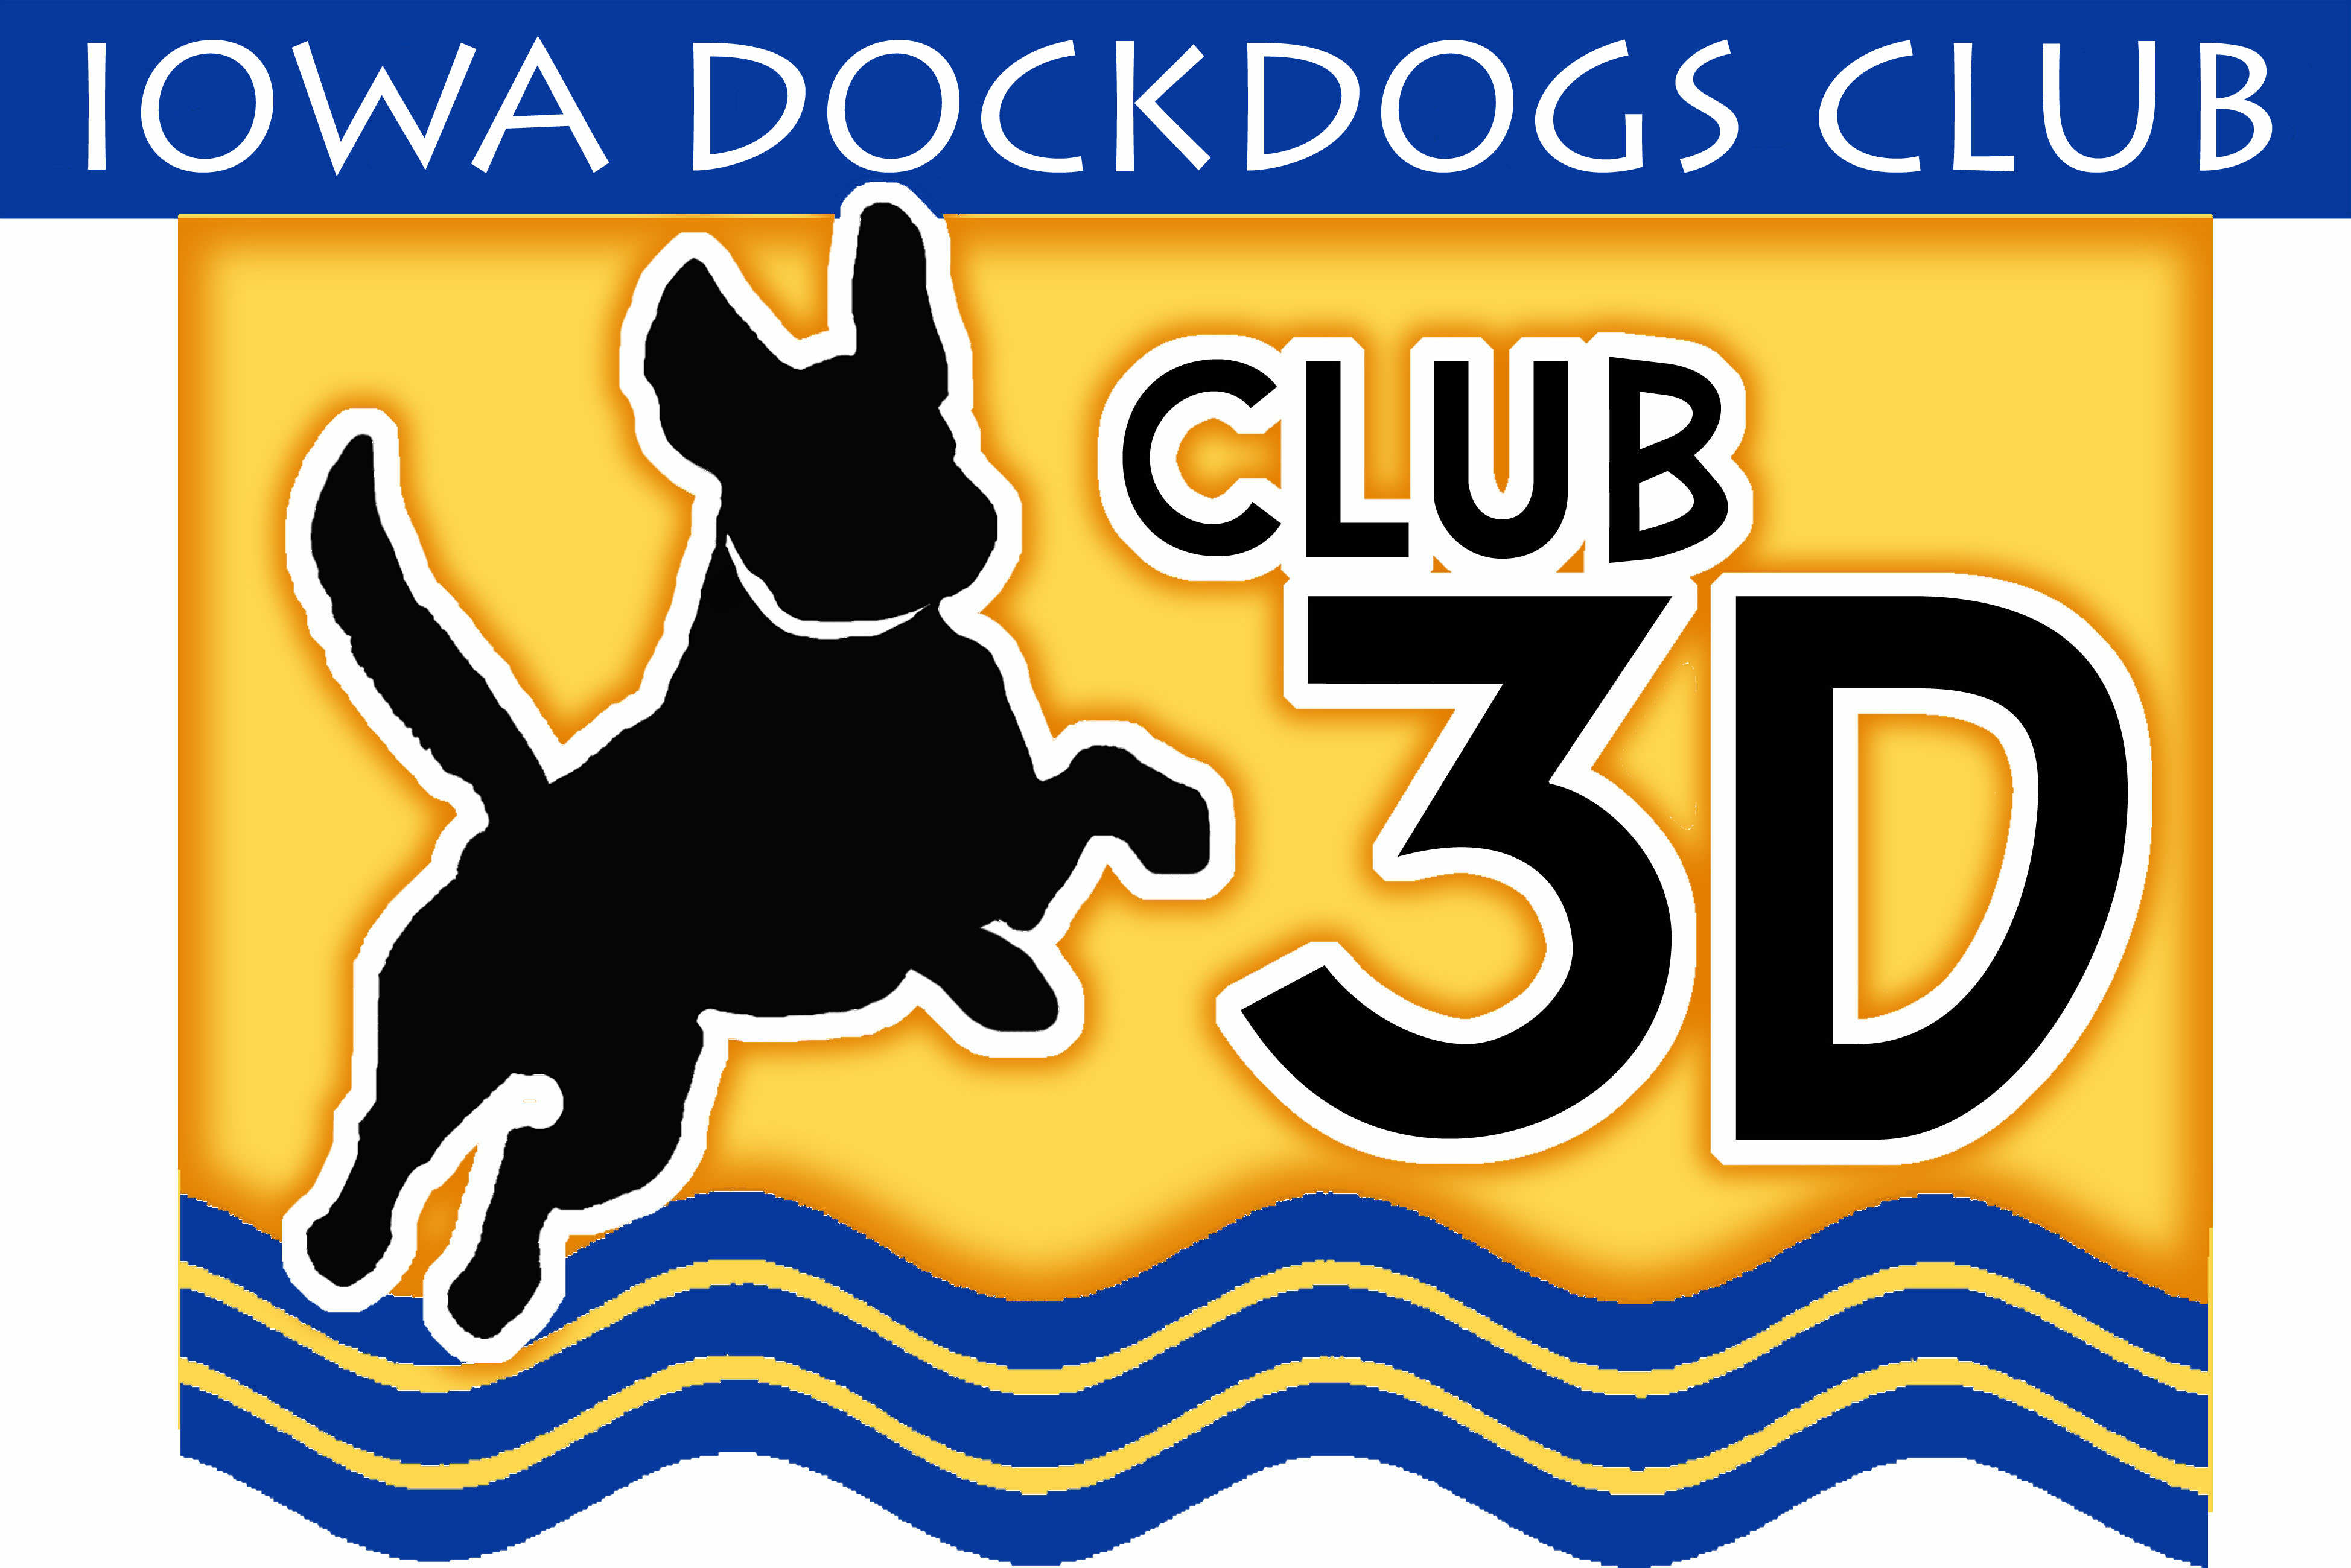 Club 3D Iowa DockDogs